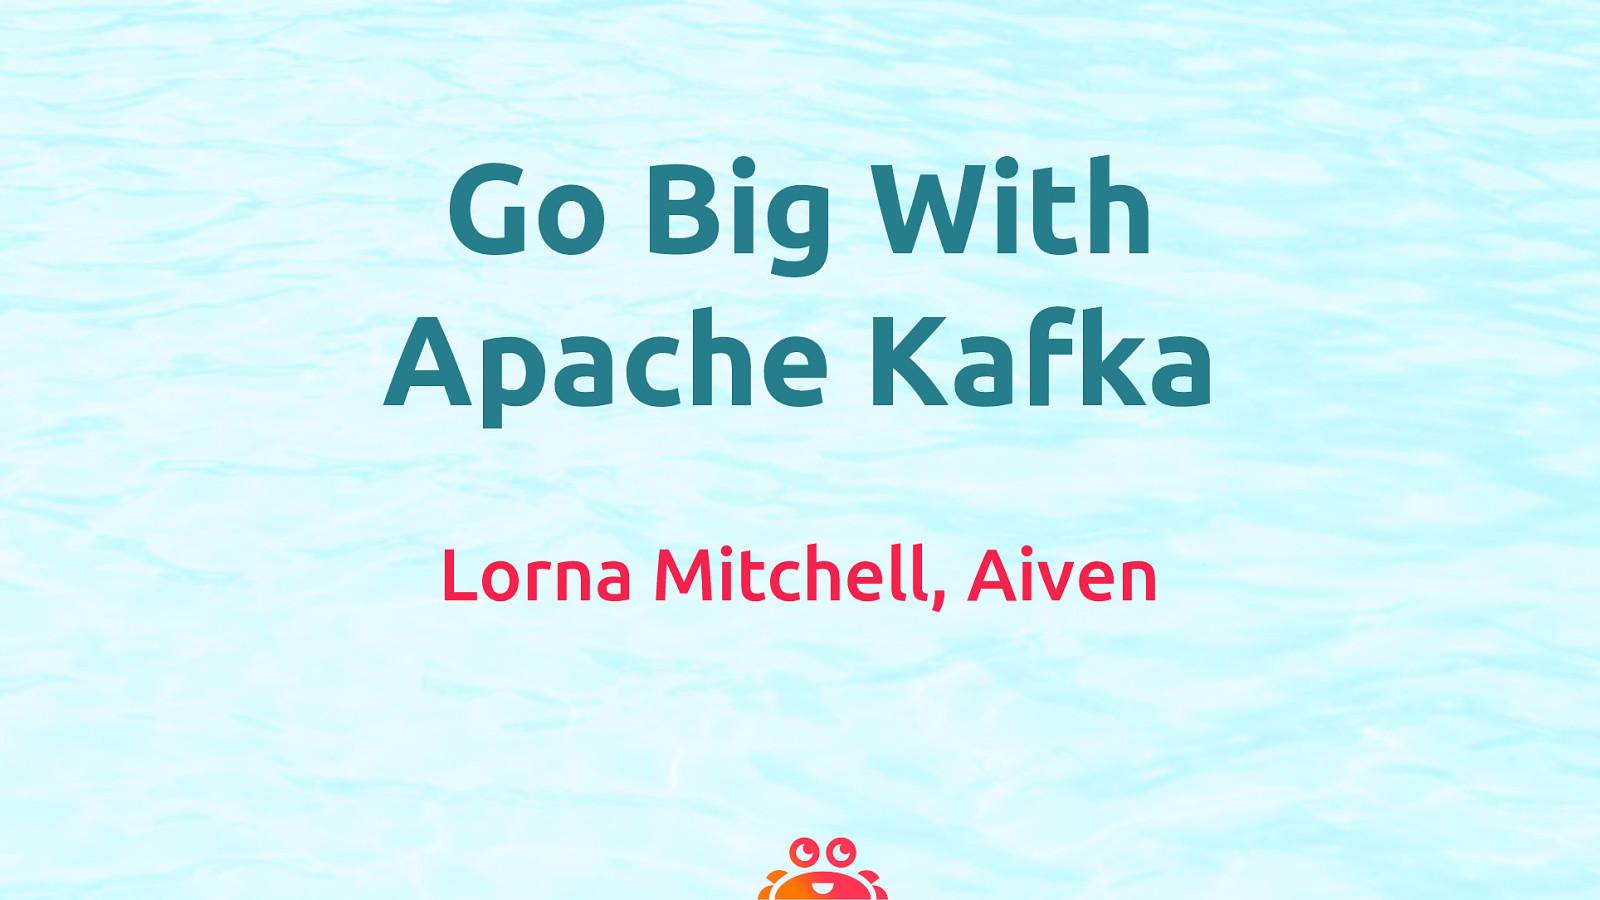 Go Big with Apache Kafka